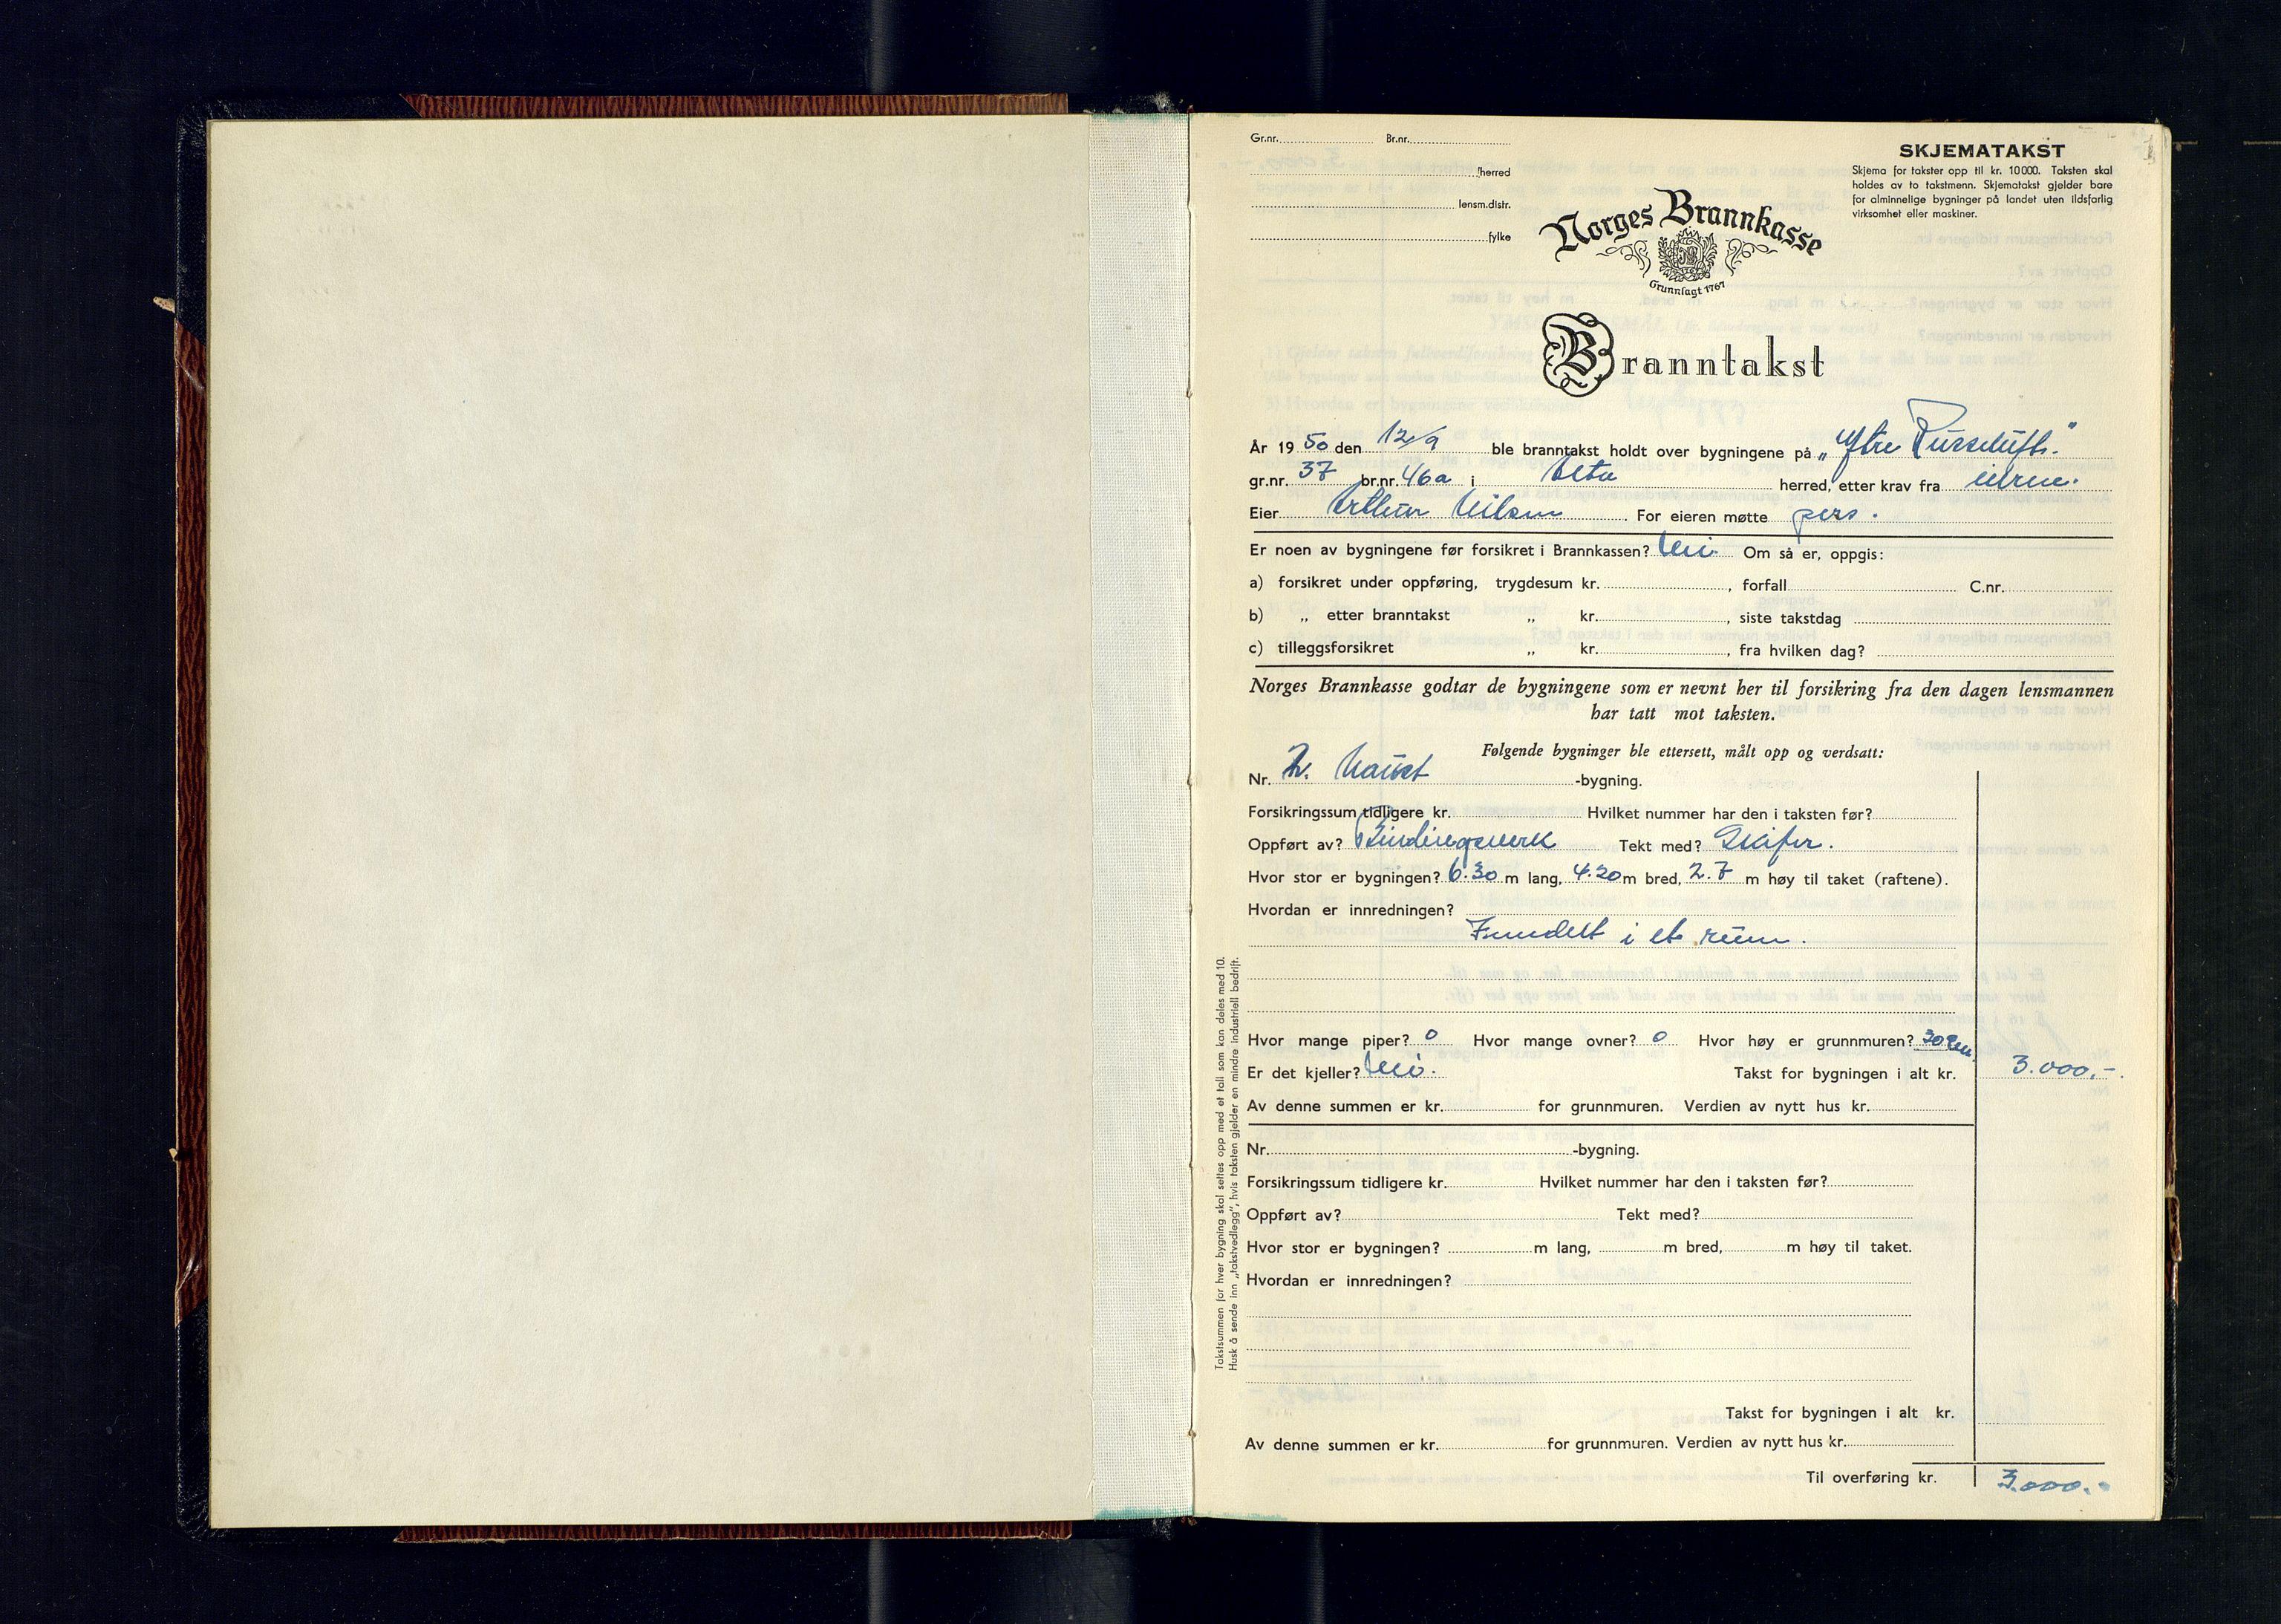 SATØ, Lensmannen i Alta, O/Ob/L0184: Branntakstprotokoll, 1950-1953, s. 1